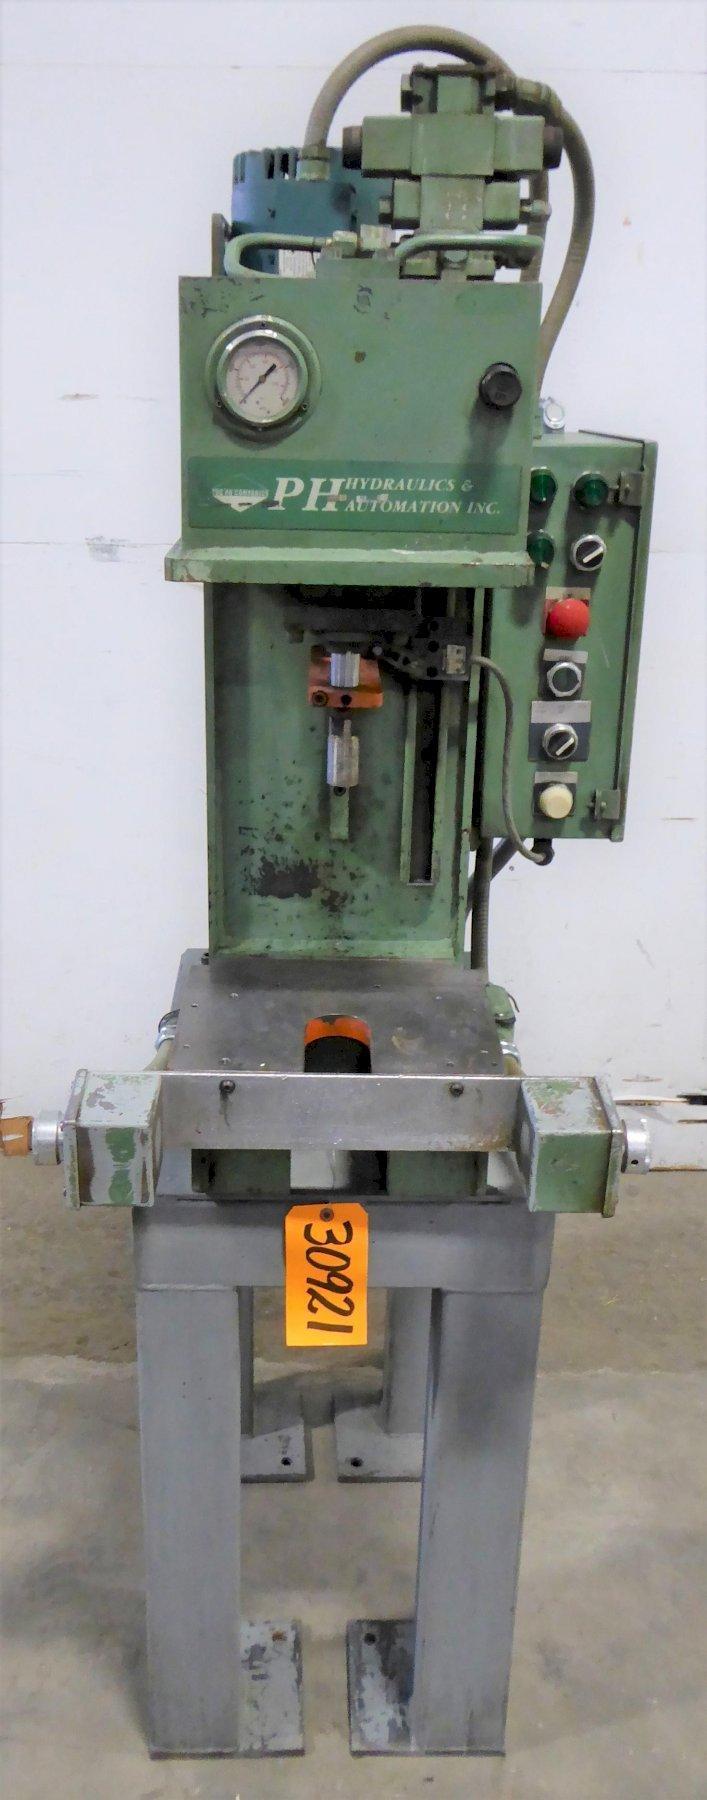 "2 Ton PH Hydraulics Gap Frame Hydraulic Press PHN-2, 6"" Str., 12"" D.L., 12"" x 10 Bed, 2 HP"